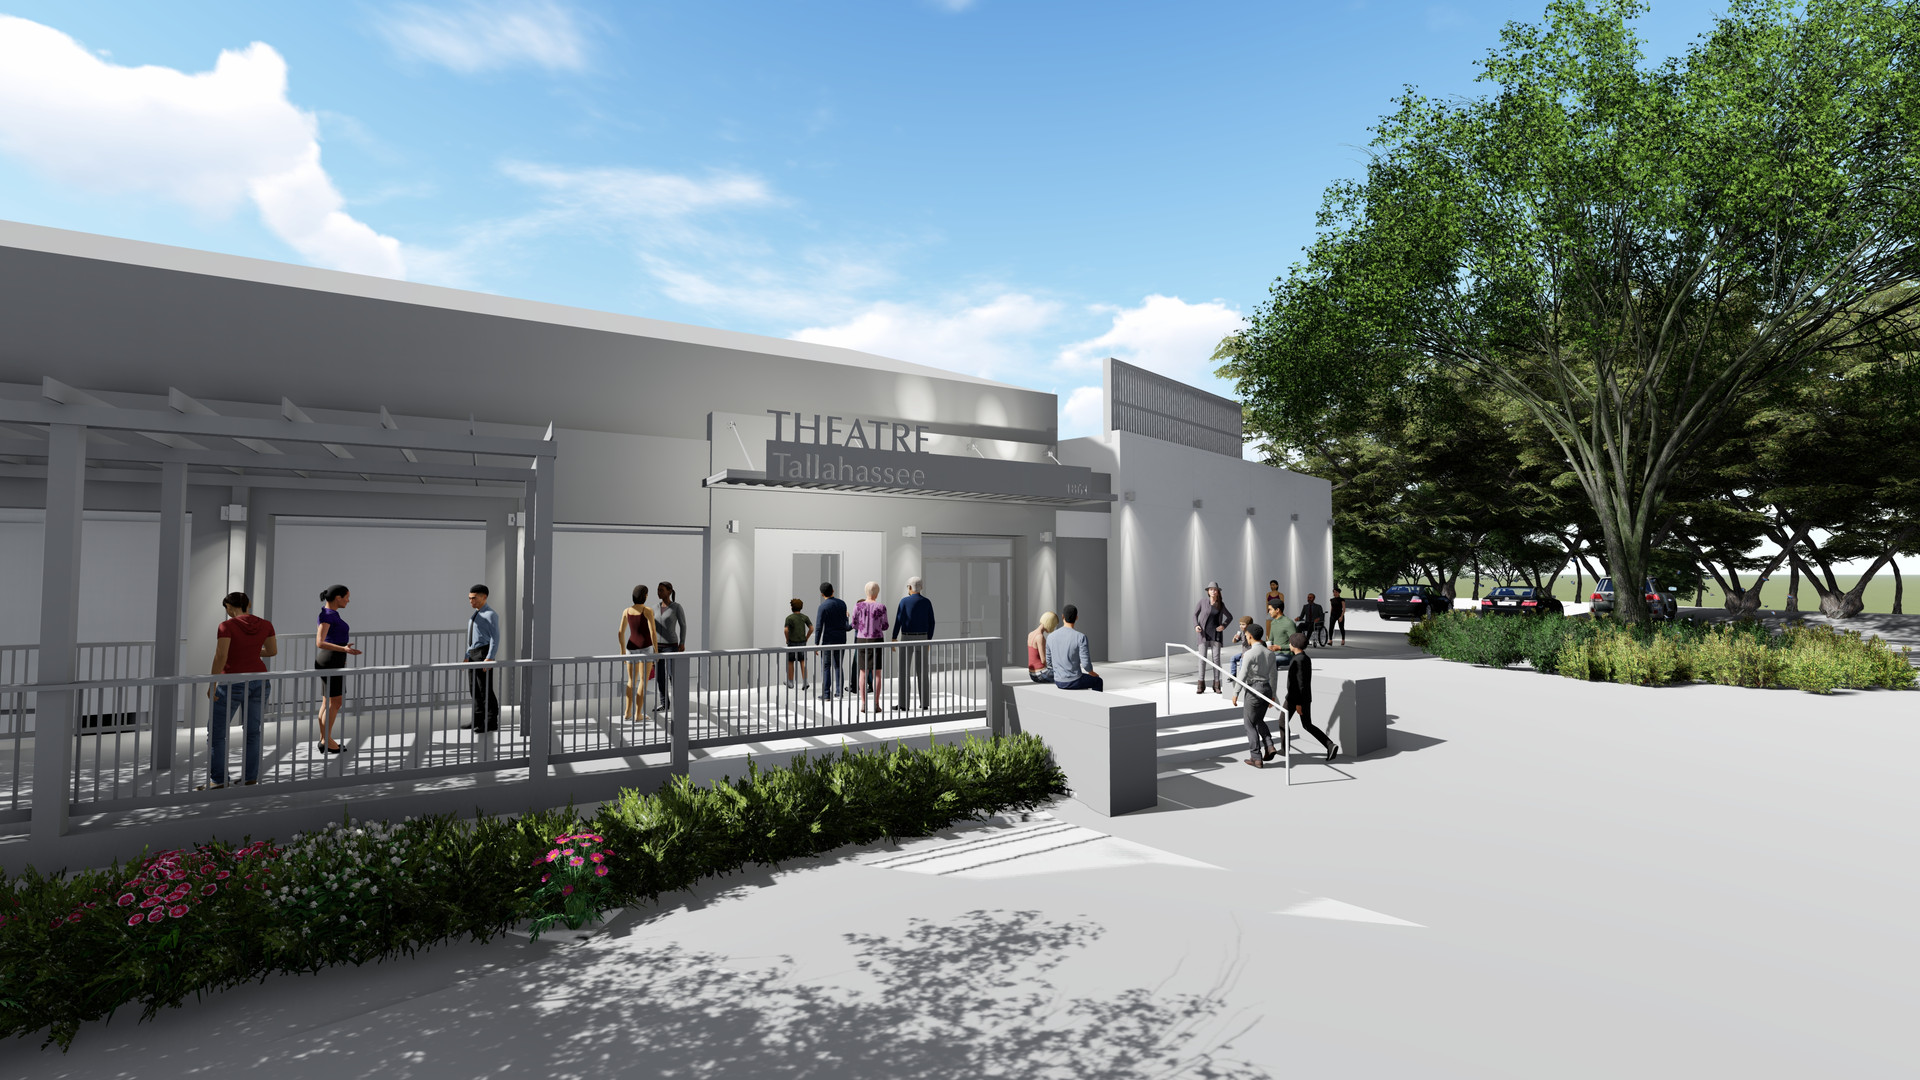 Theatre Tallahassee